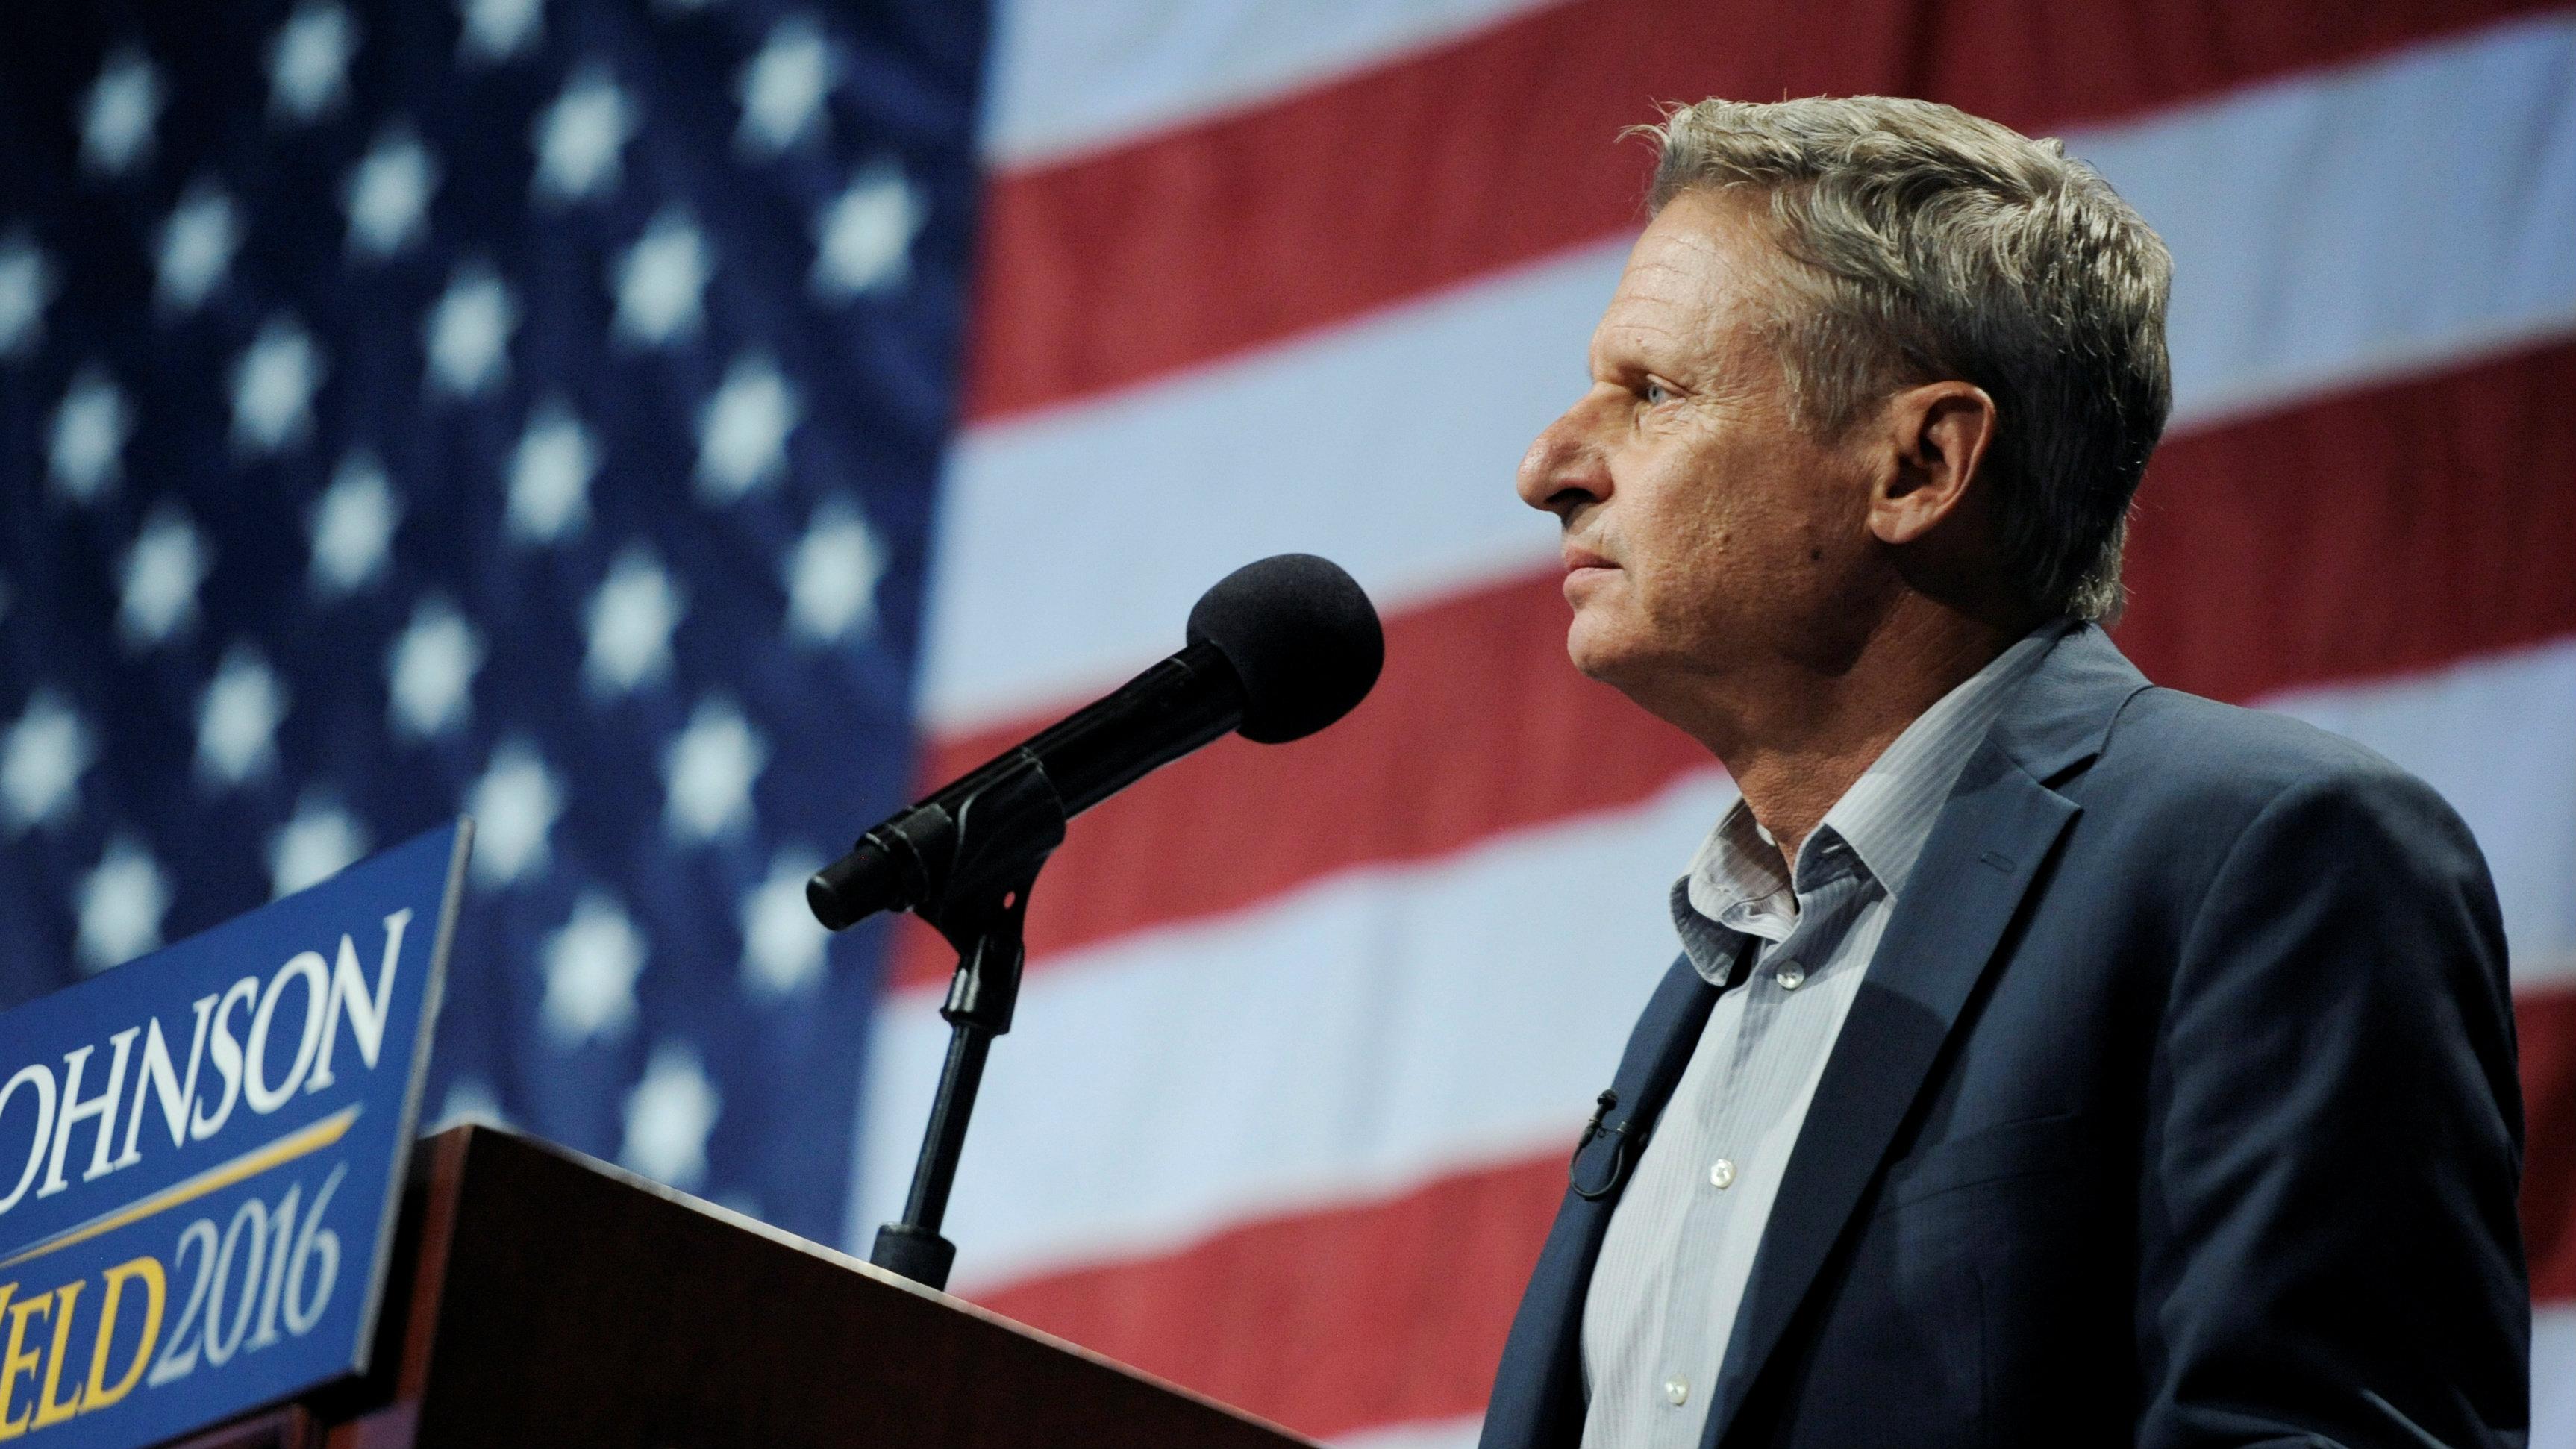 Libertarian presidential candidate Gary Johnson speaks at a rally in New York, U.S., September 10, 2016. REUTERS/Mark Kauzlarich